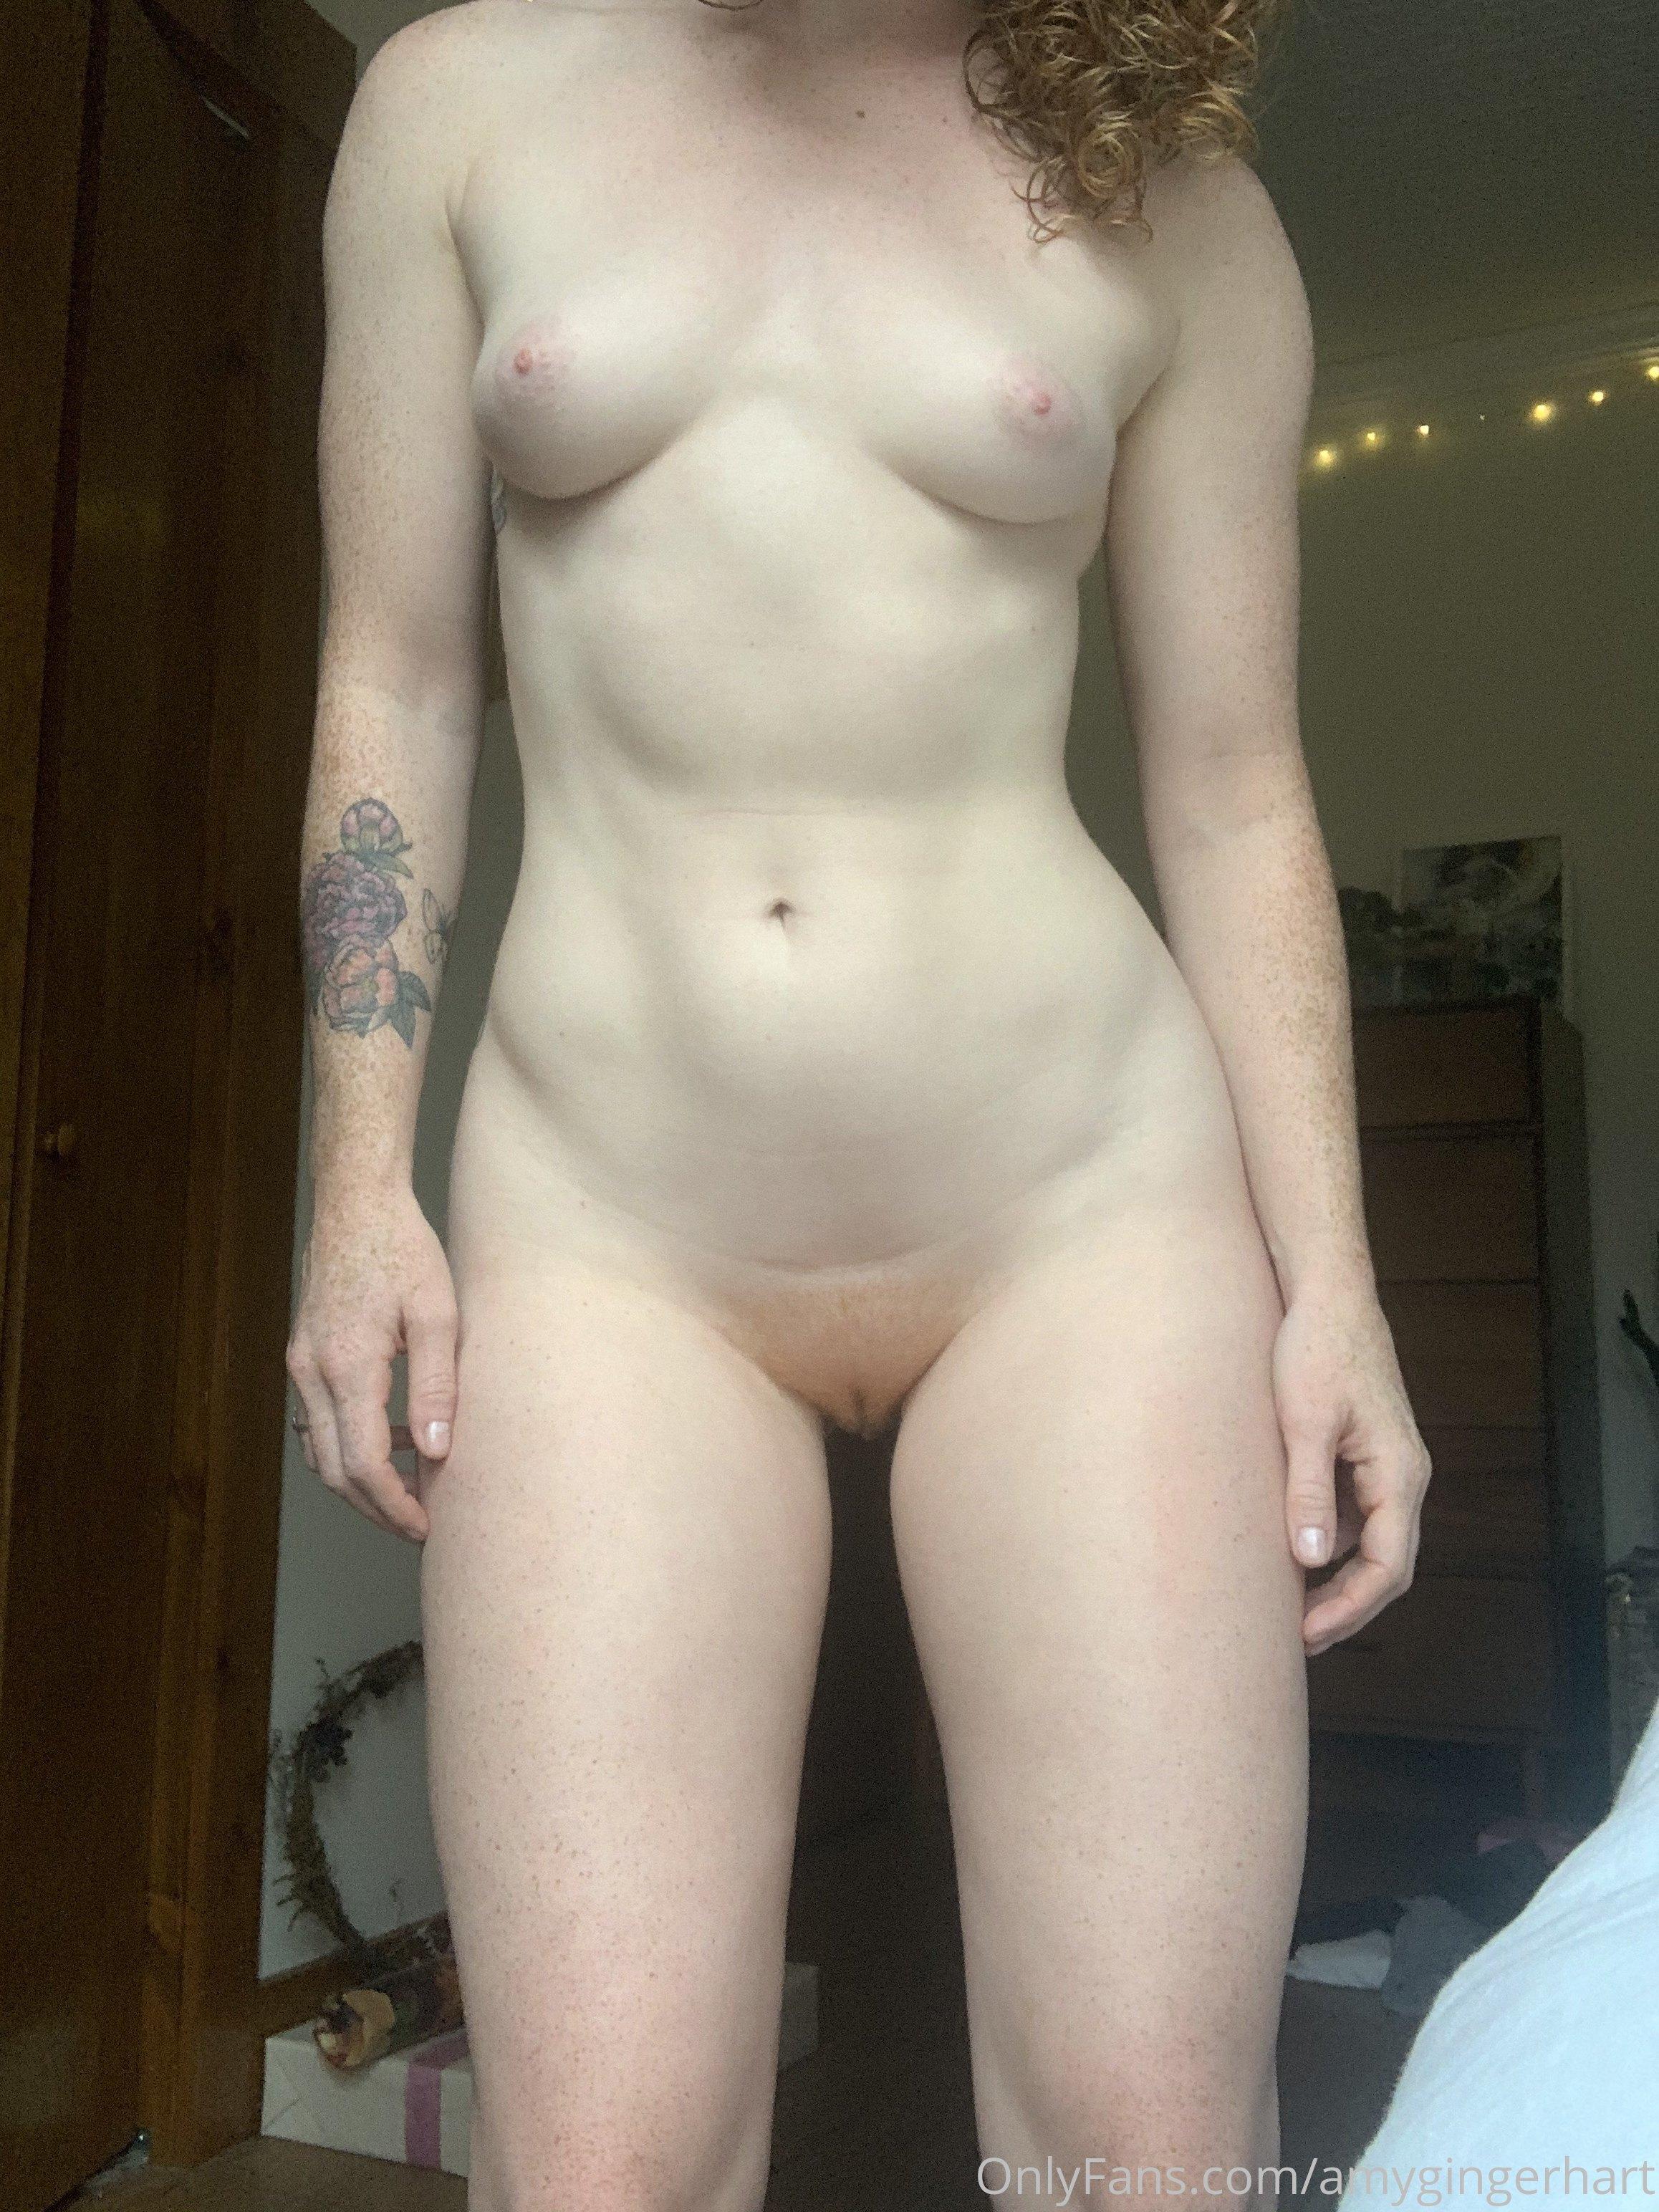 Amy Hart, Amygingerhart, Onlyfans 0148